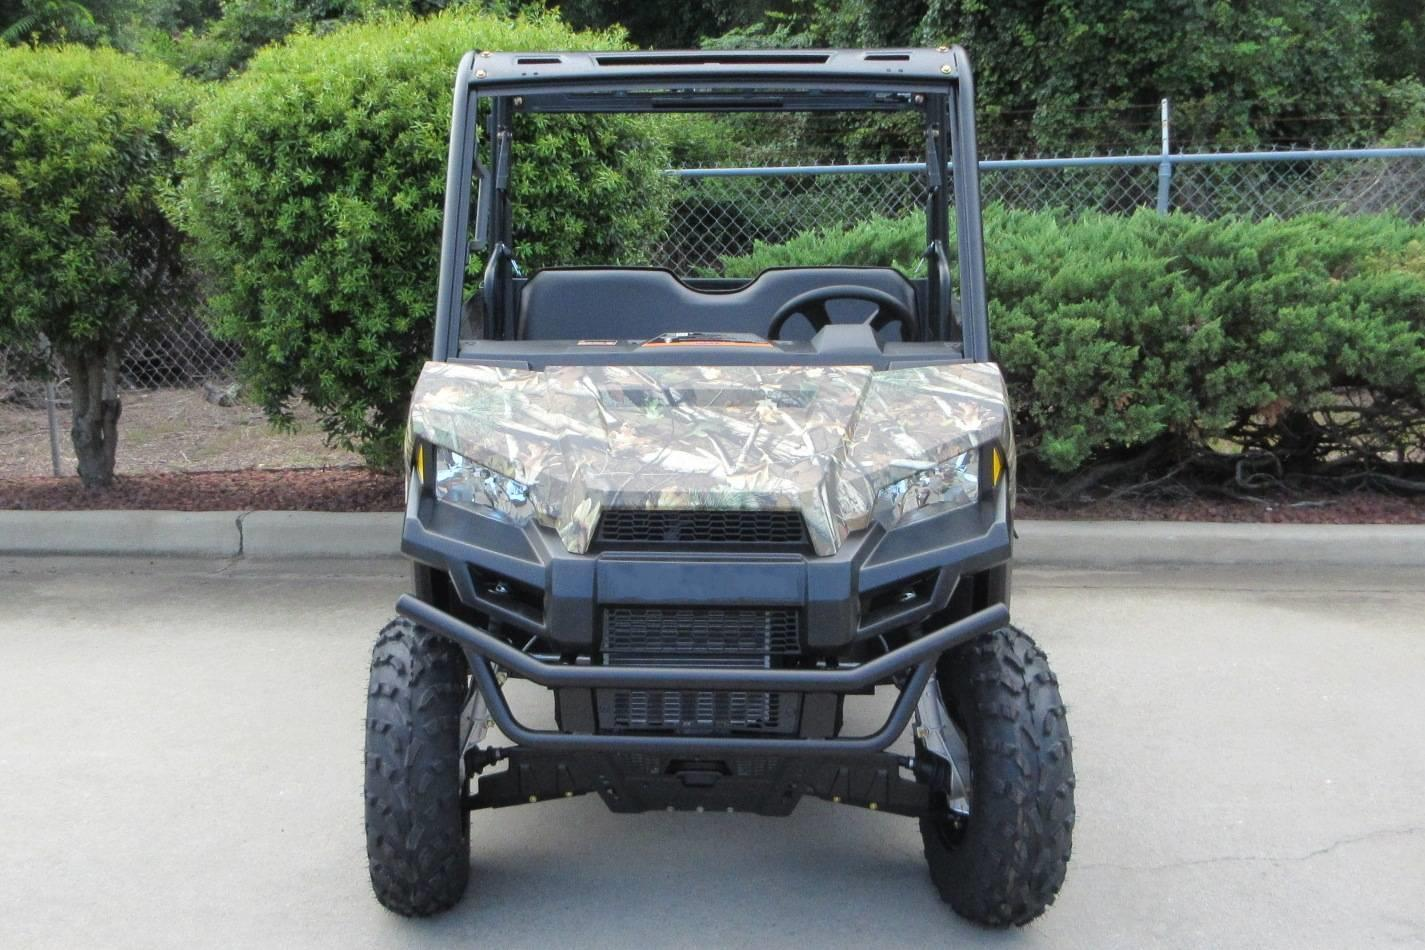 Hot Selling Ranger 570 Pursuit Camo UTV 4